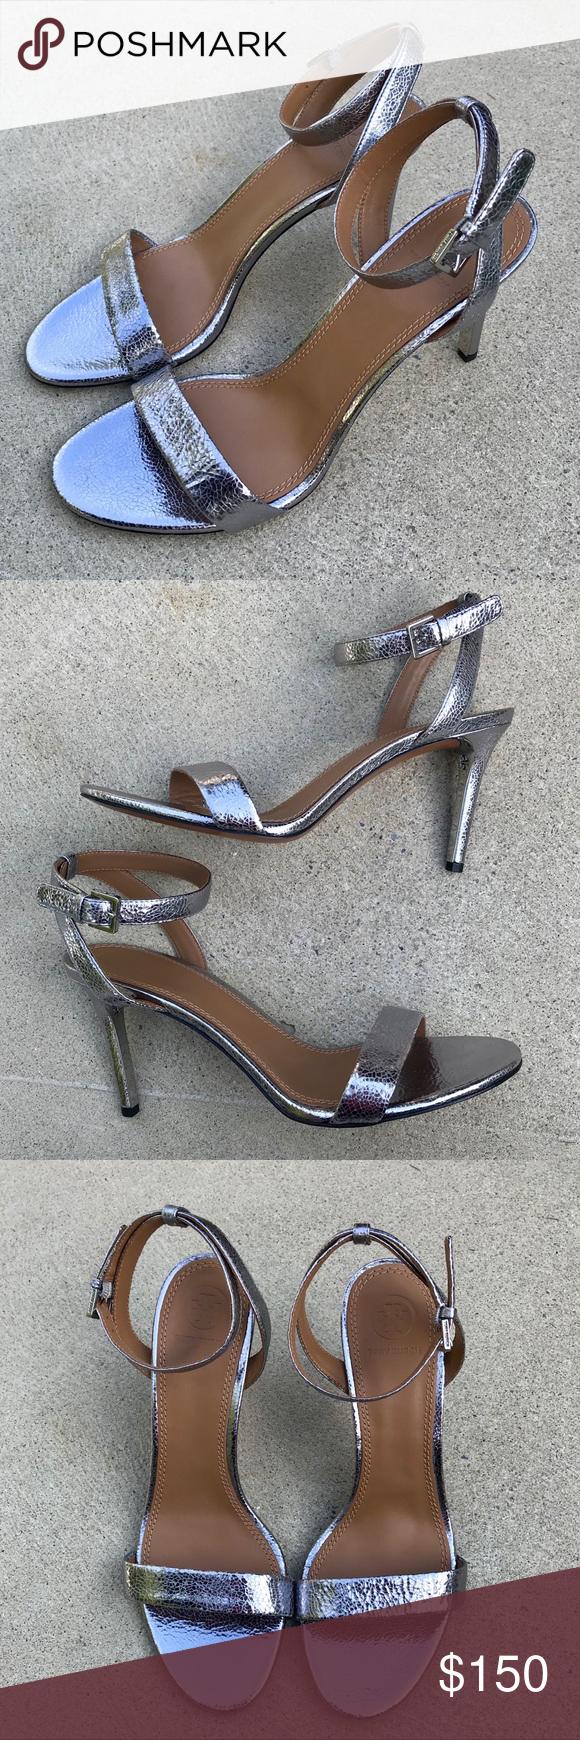 ea987462375 Tory Burch Elana 85mm Heels Pre-owned Tory Burch Elana 85mm Sandal Heels. US